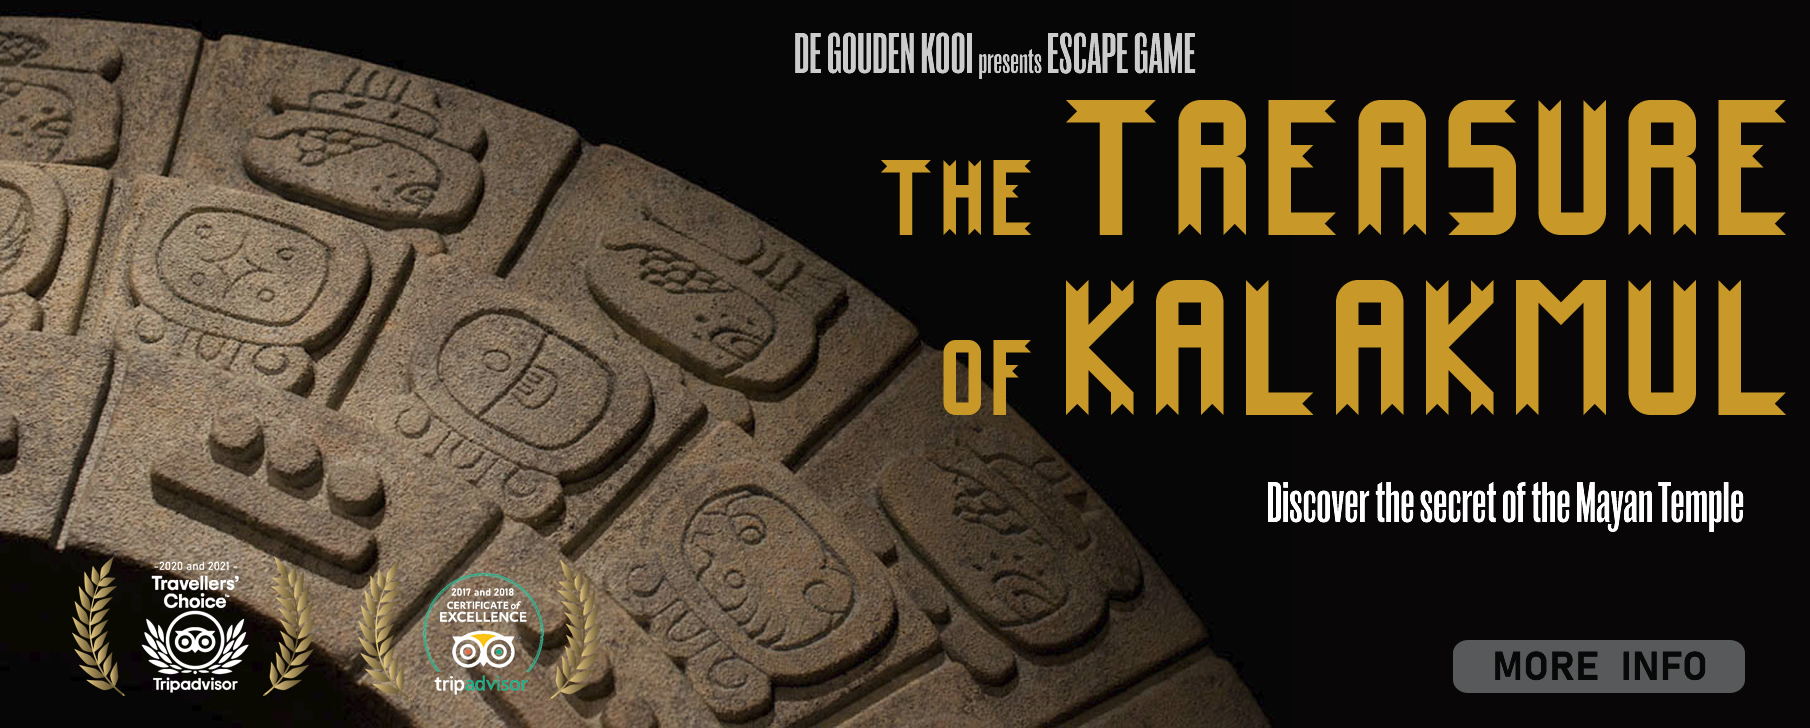 Escape game De Gouden Kooi - treasure of kalakmul